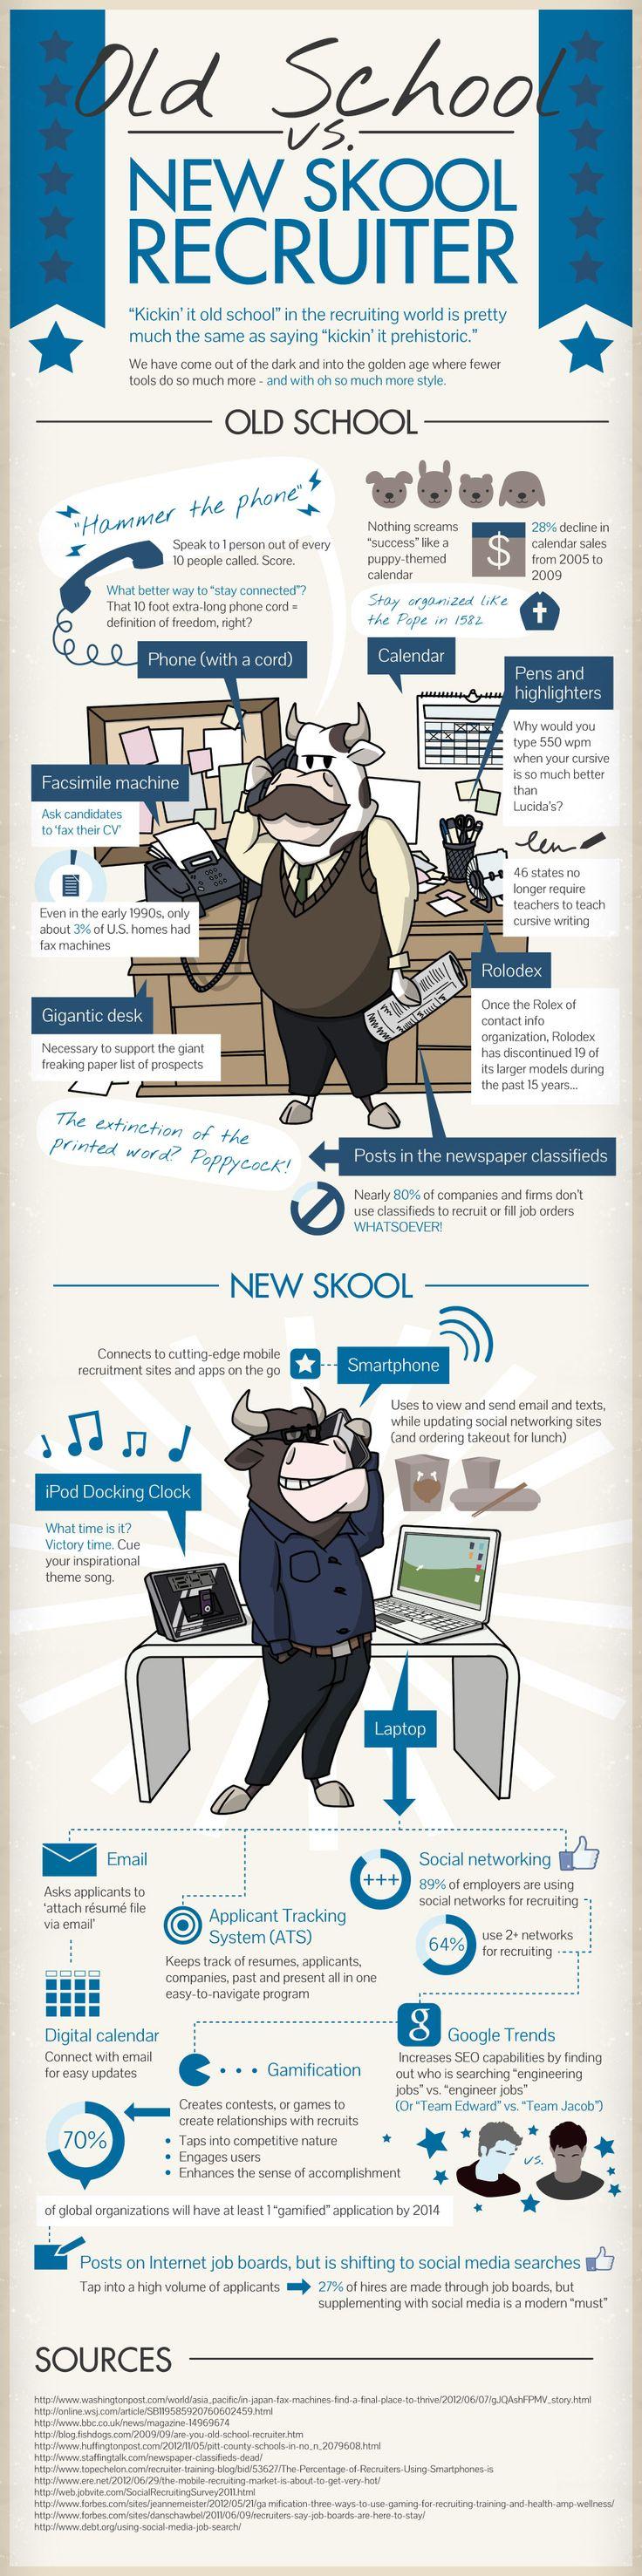 Old School v New School Recruiting #coopetitividadH2H cc @anlsm30 #socialmedia